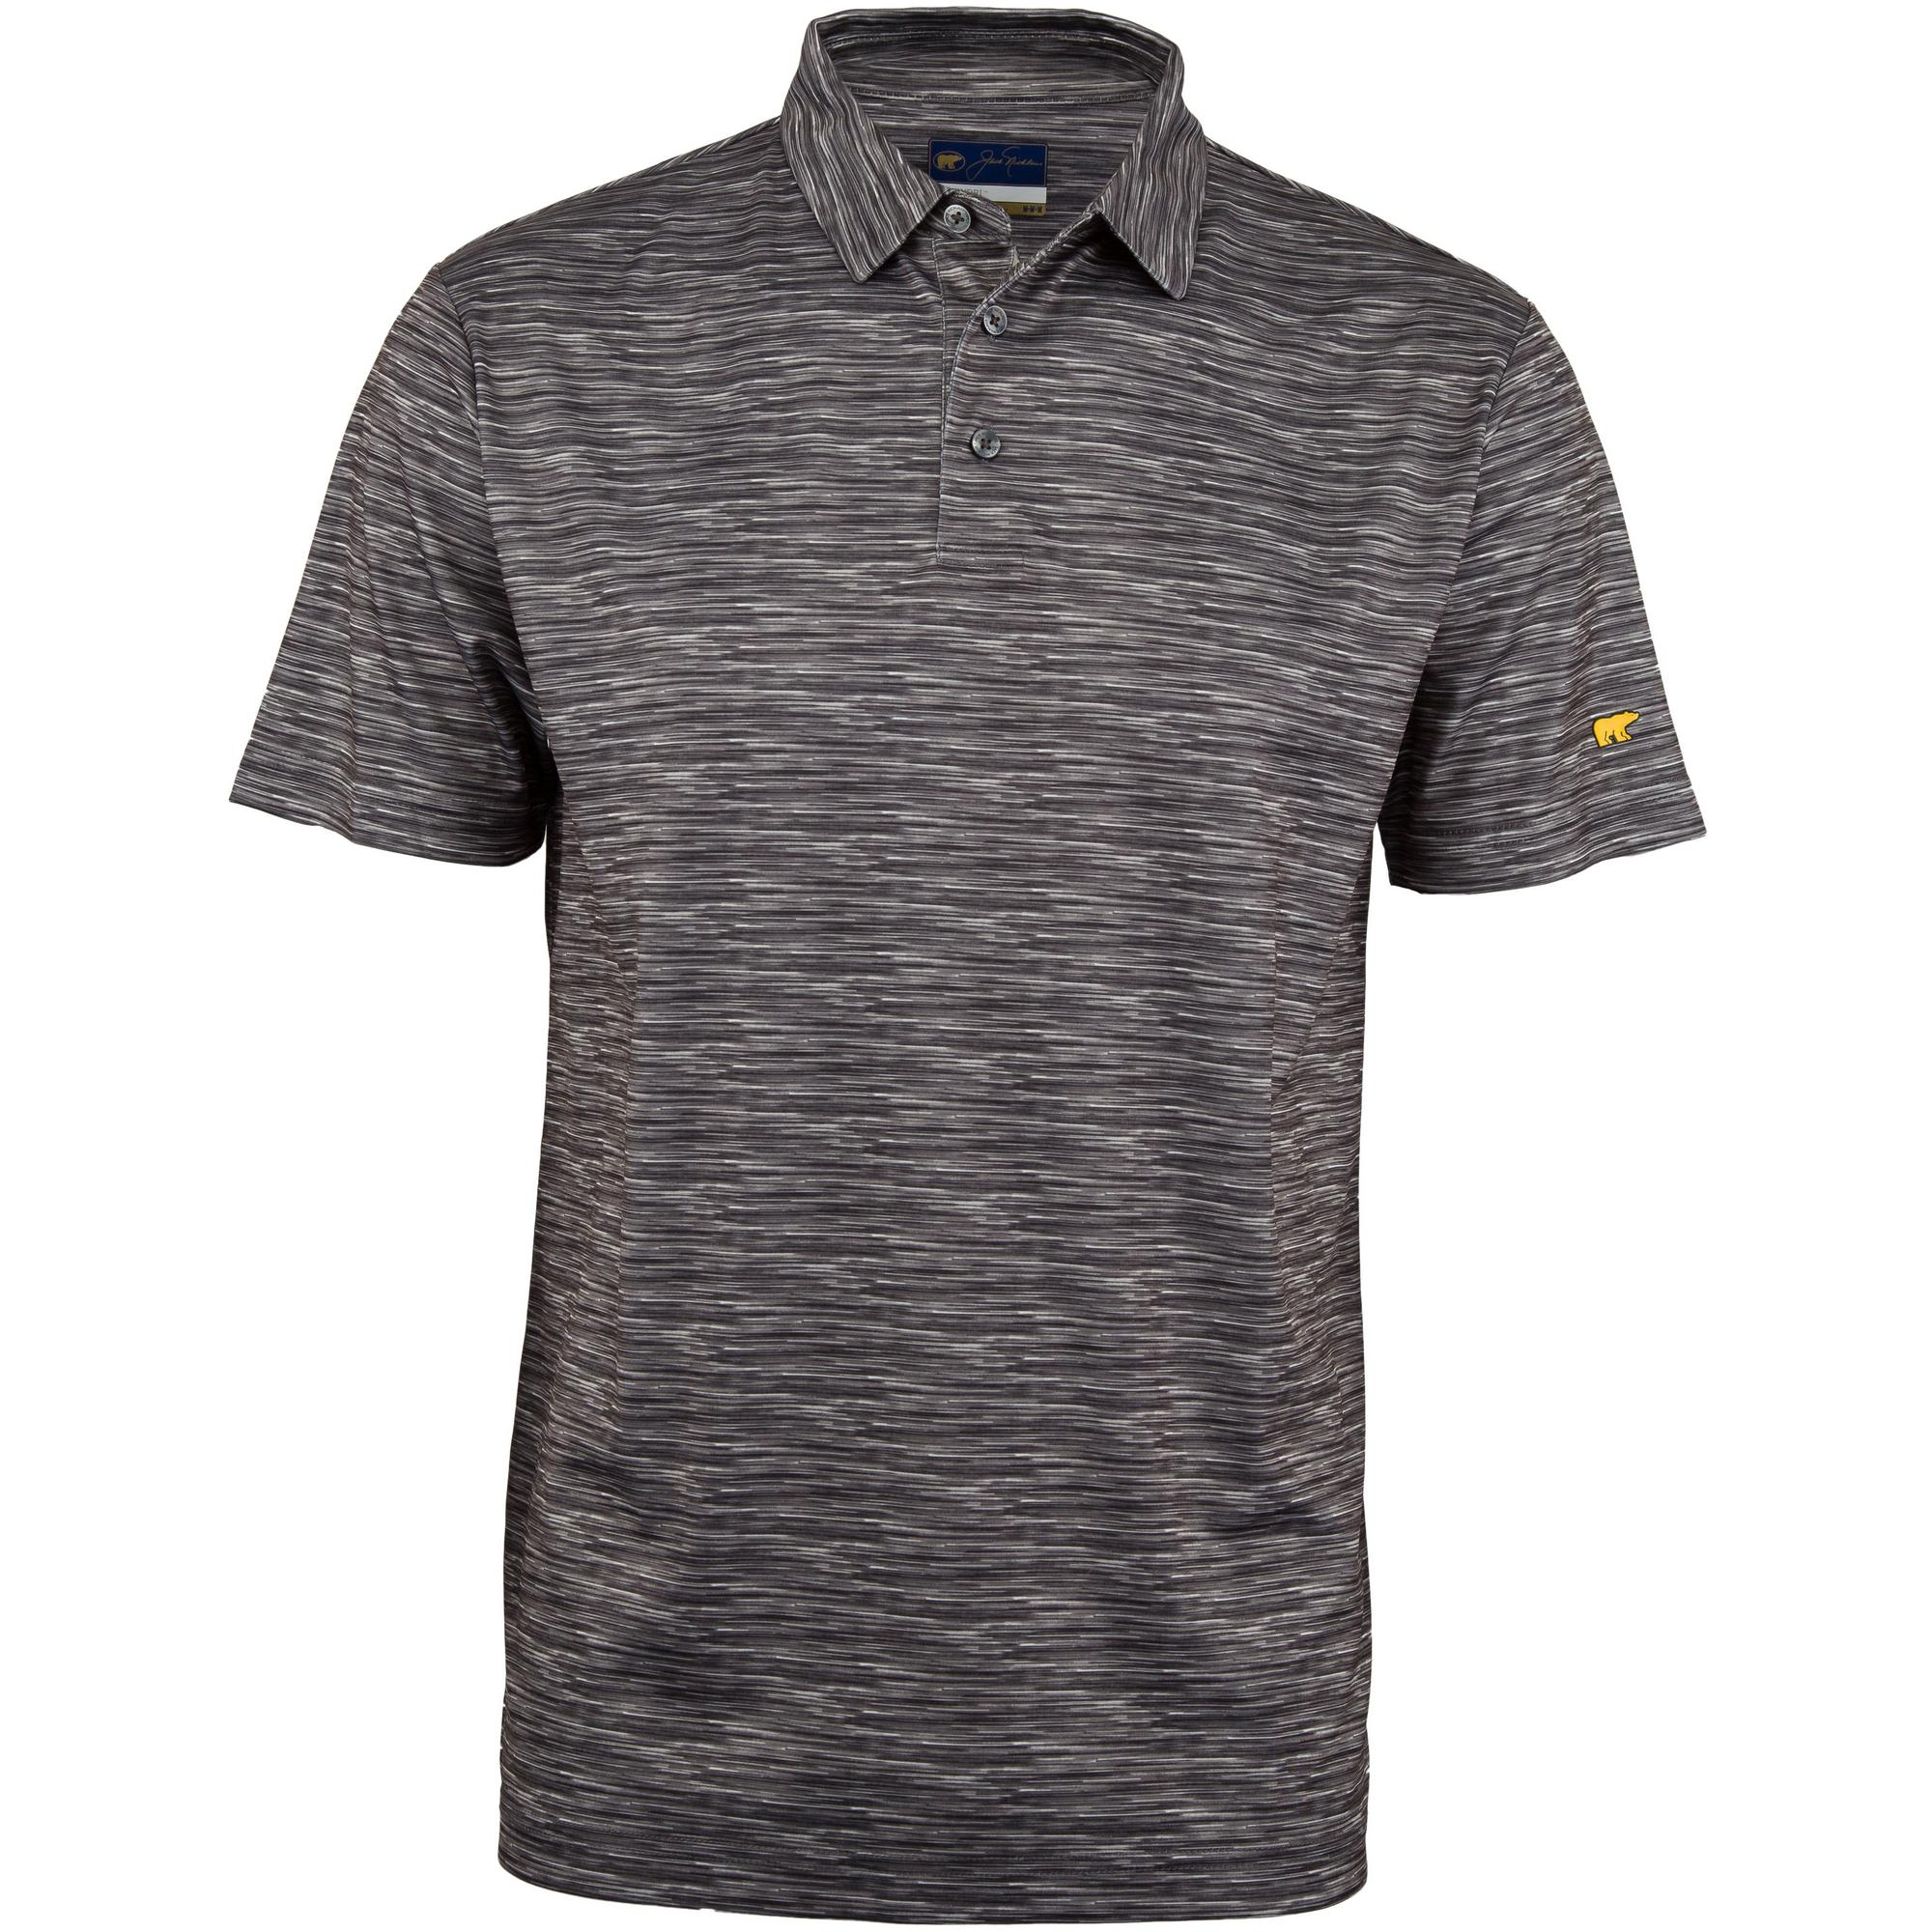 Men's B&T Space Dye Short Sleeve Polo